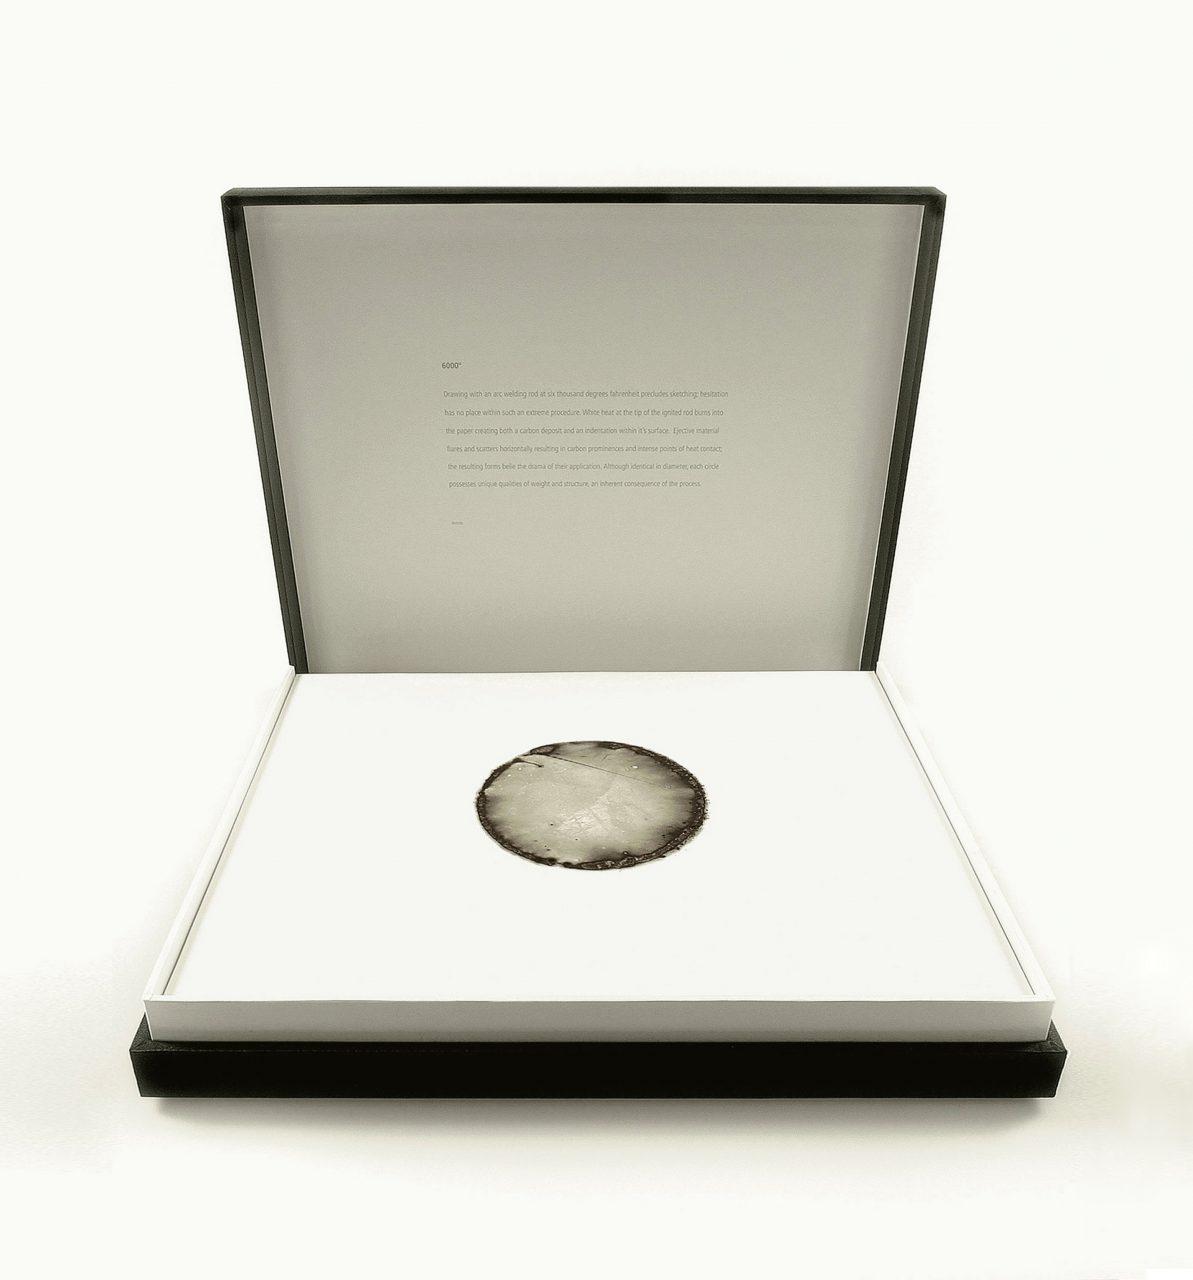 6000º, 2006 six thousand degrees fahrenheit on cotton fibre housed within archival Solander case 43.0 x 52.4 x 7.3 cm